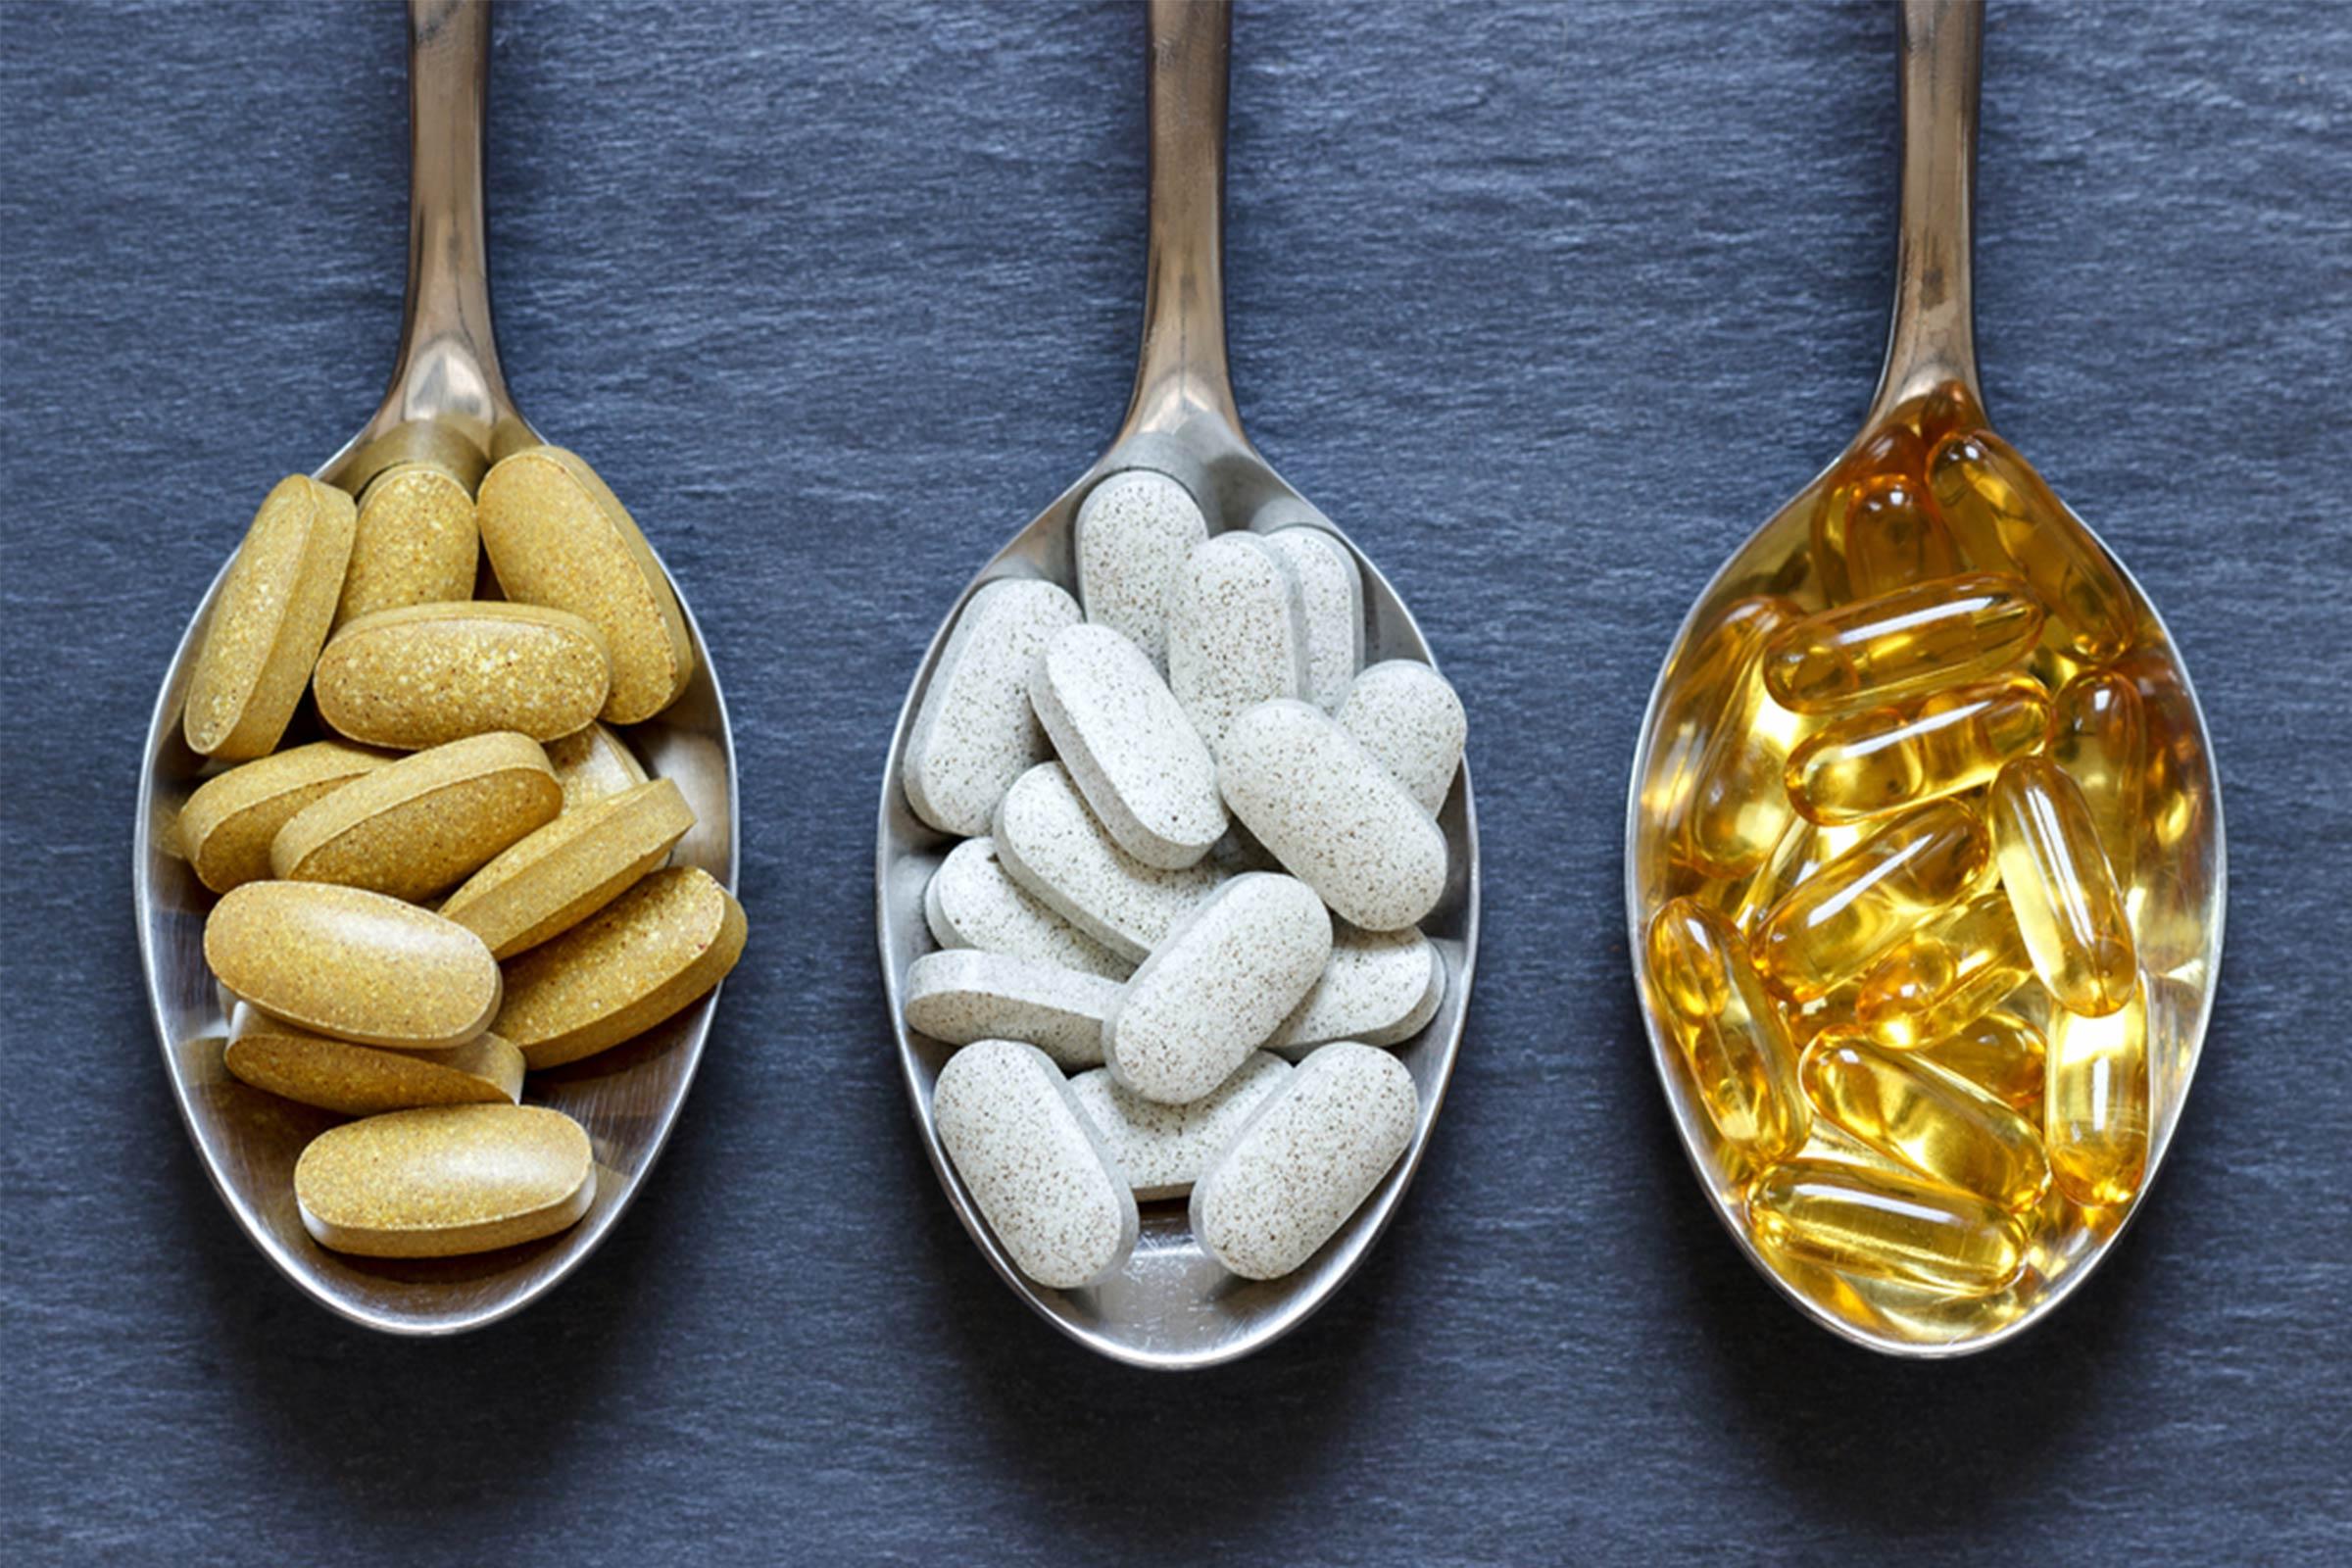 vitamins that help regulate energy levels